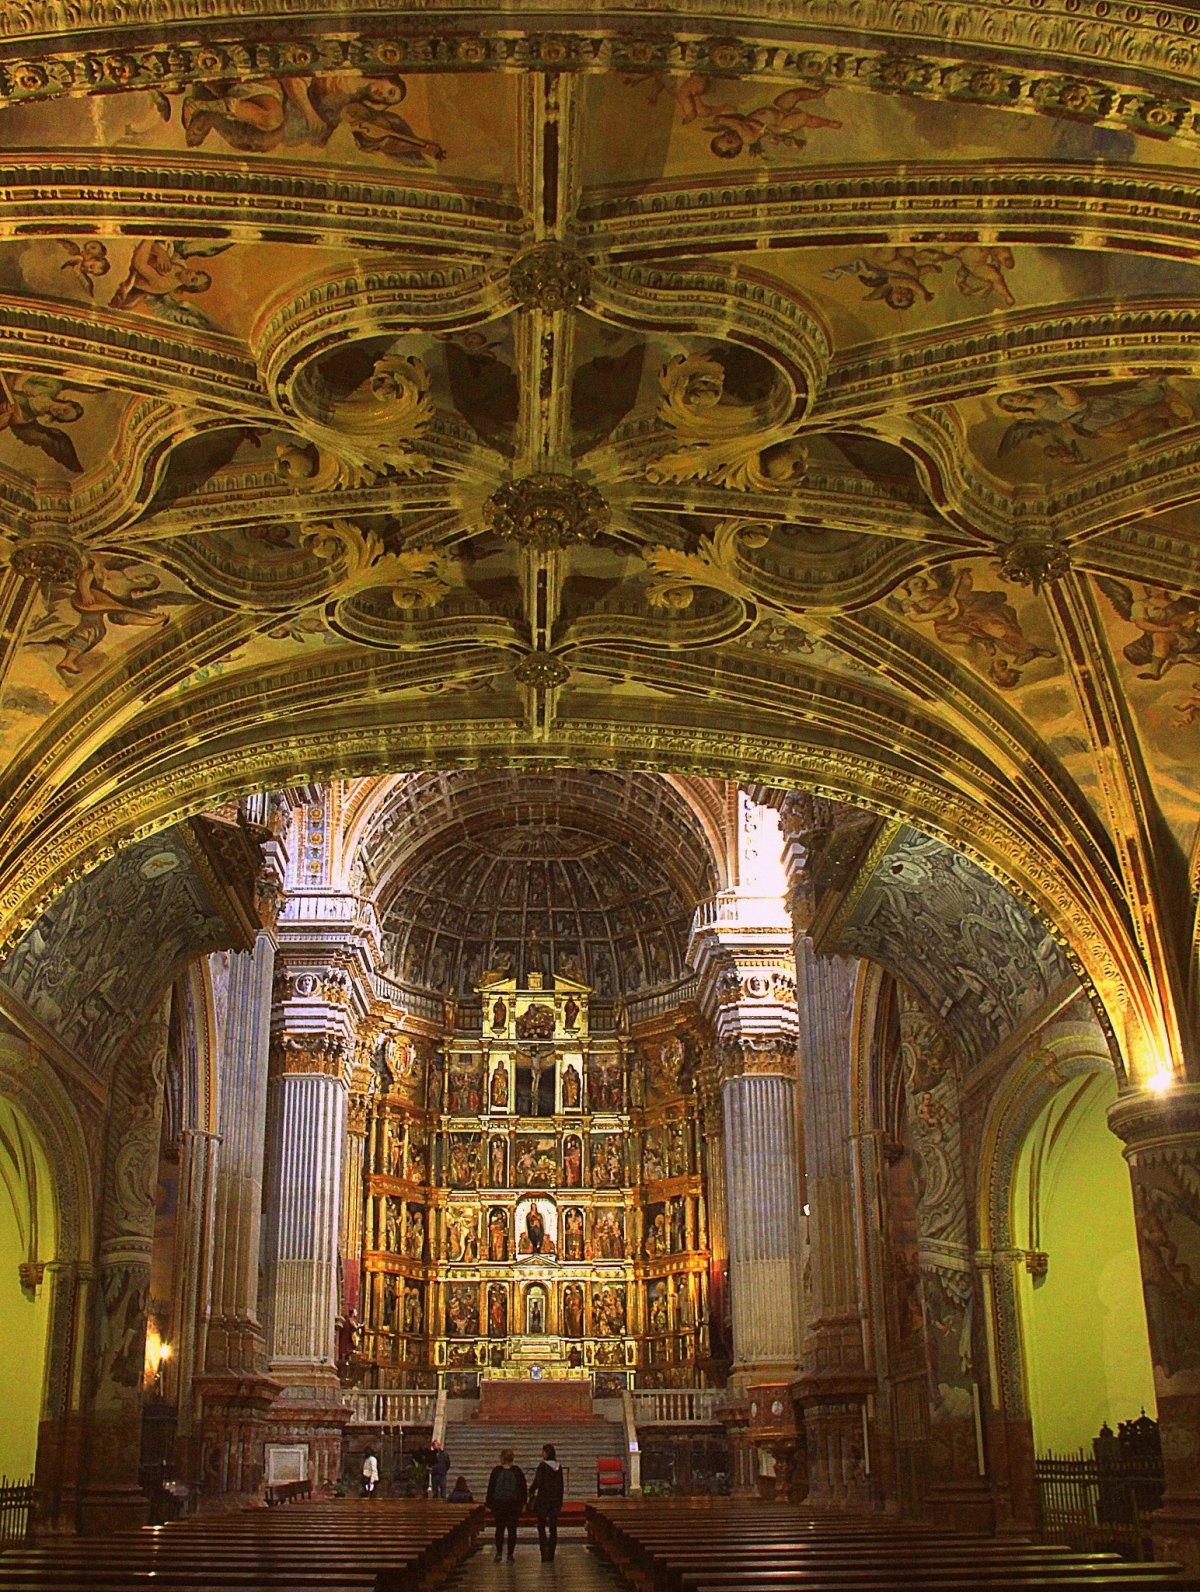 Granada has more than just Alhambra